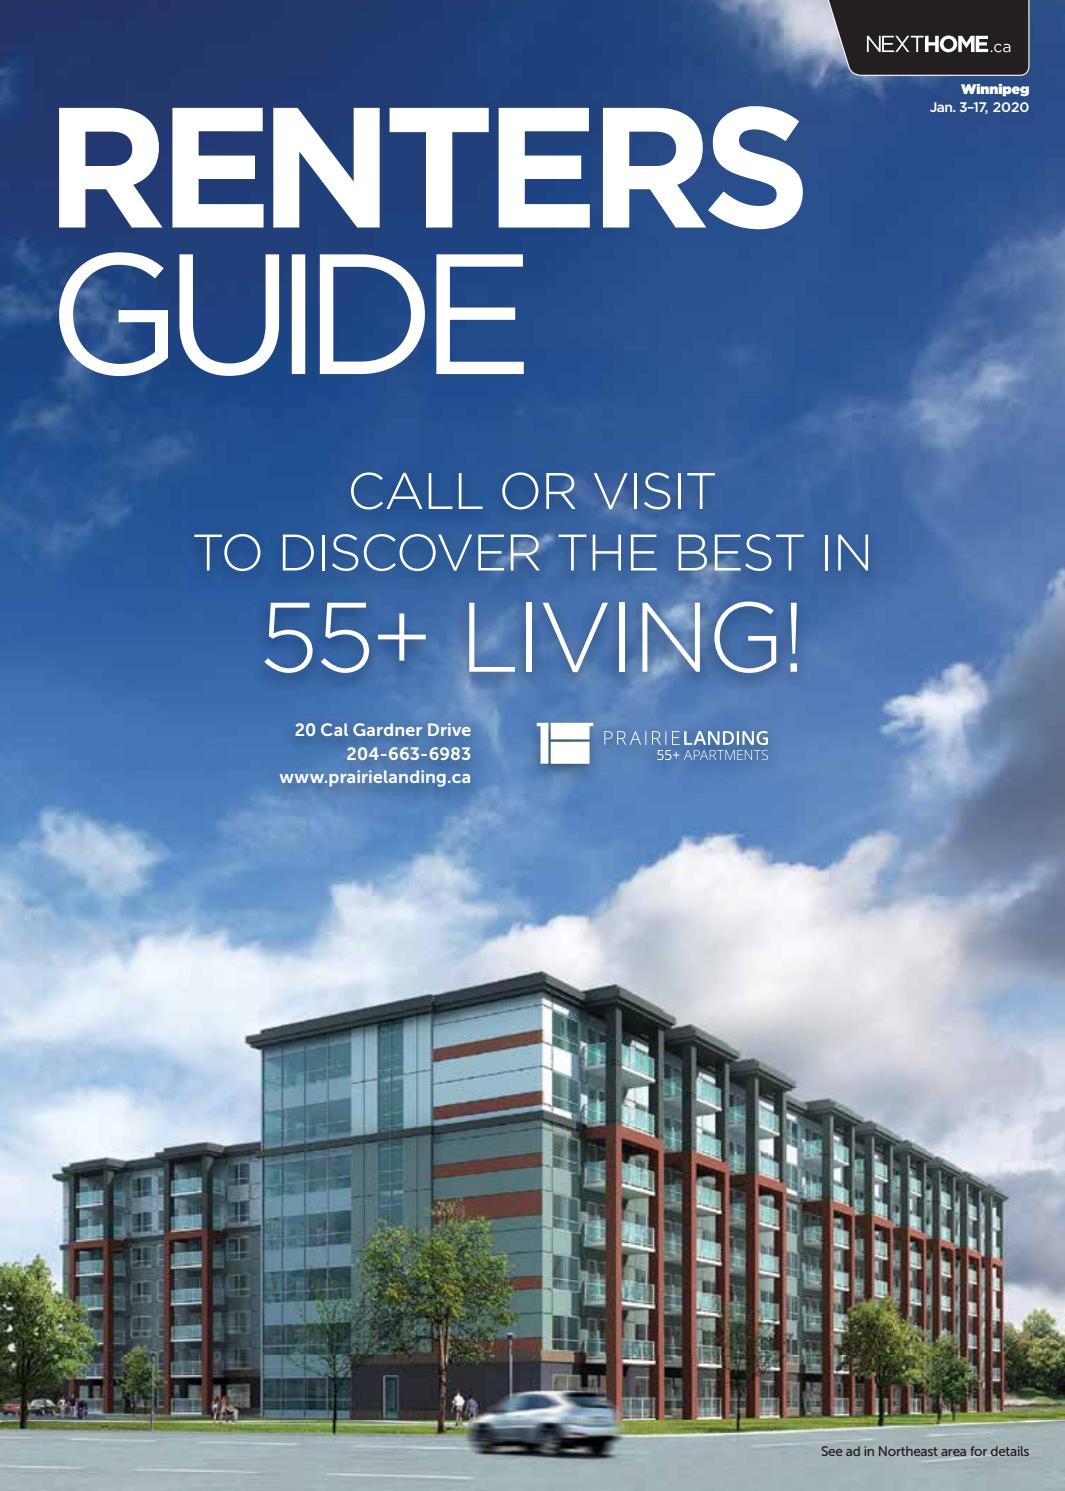 Winnipeg Renters Guide January 3 2020 By Nexthome Issuu